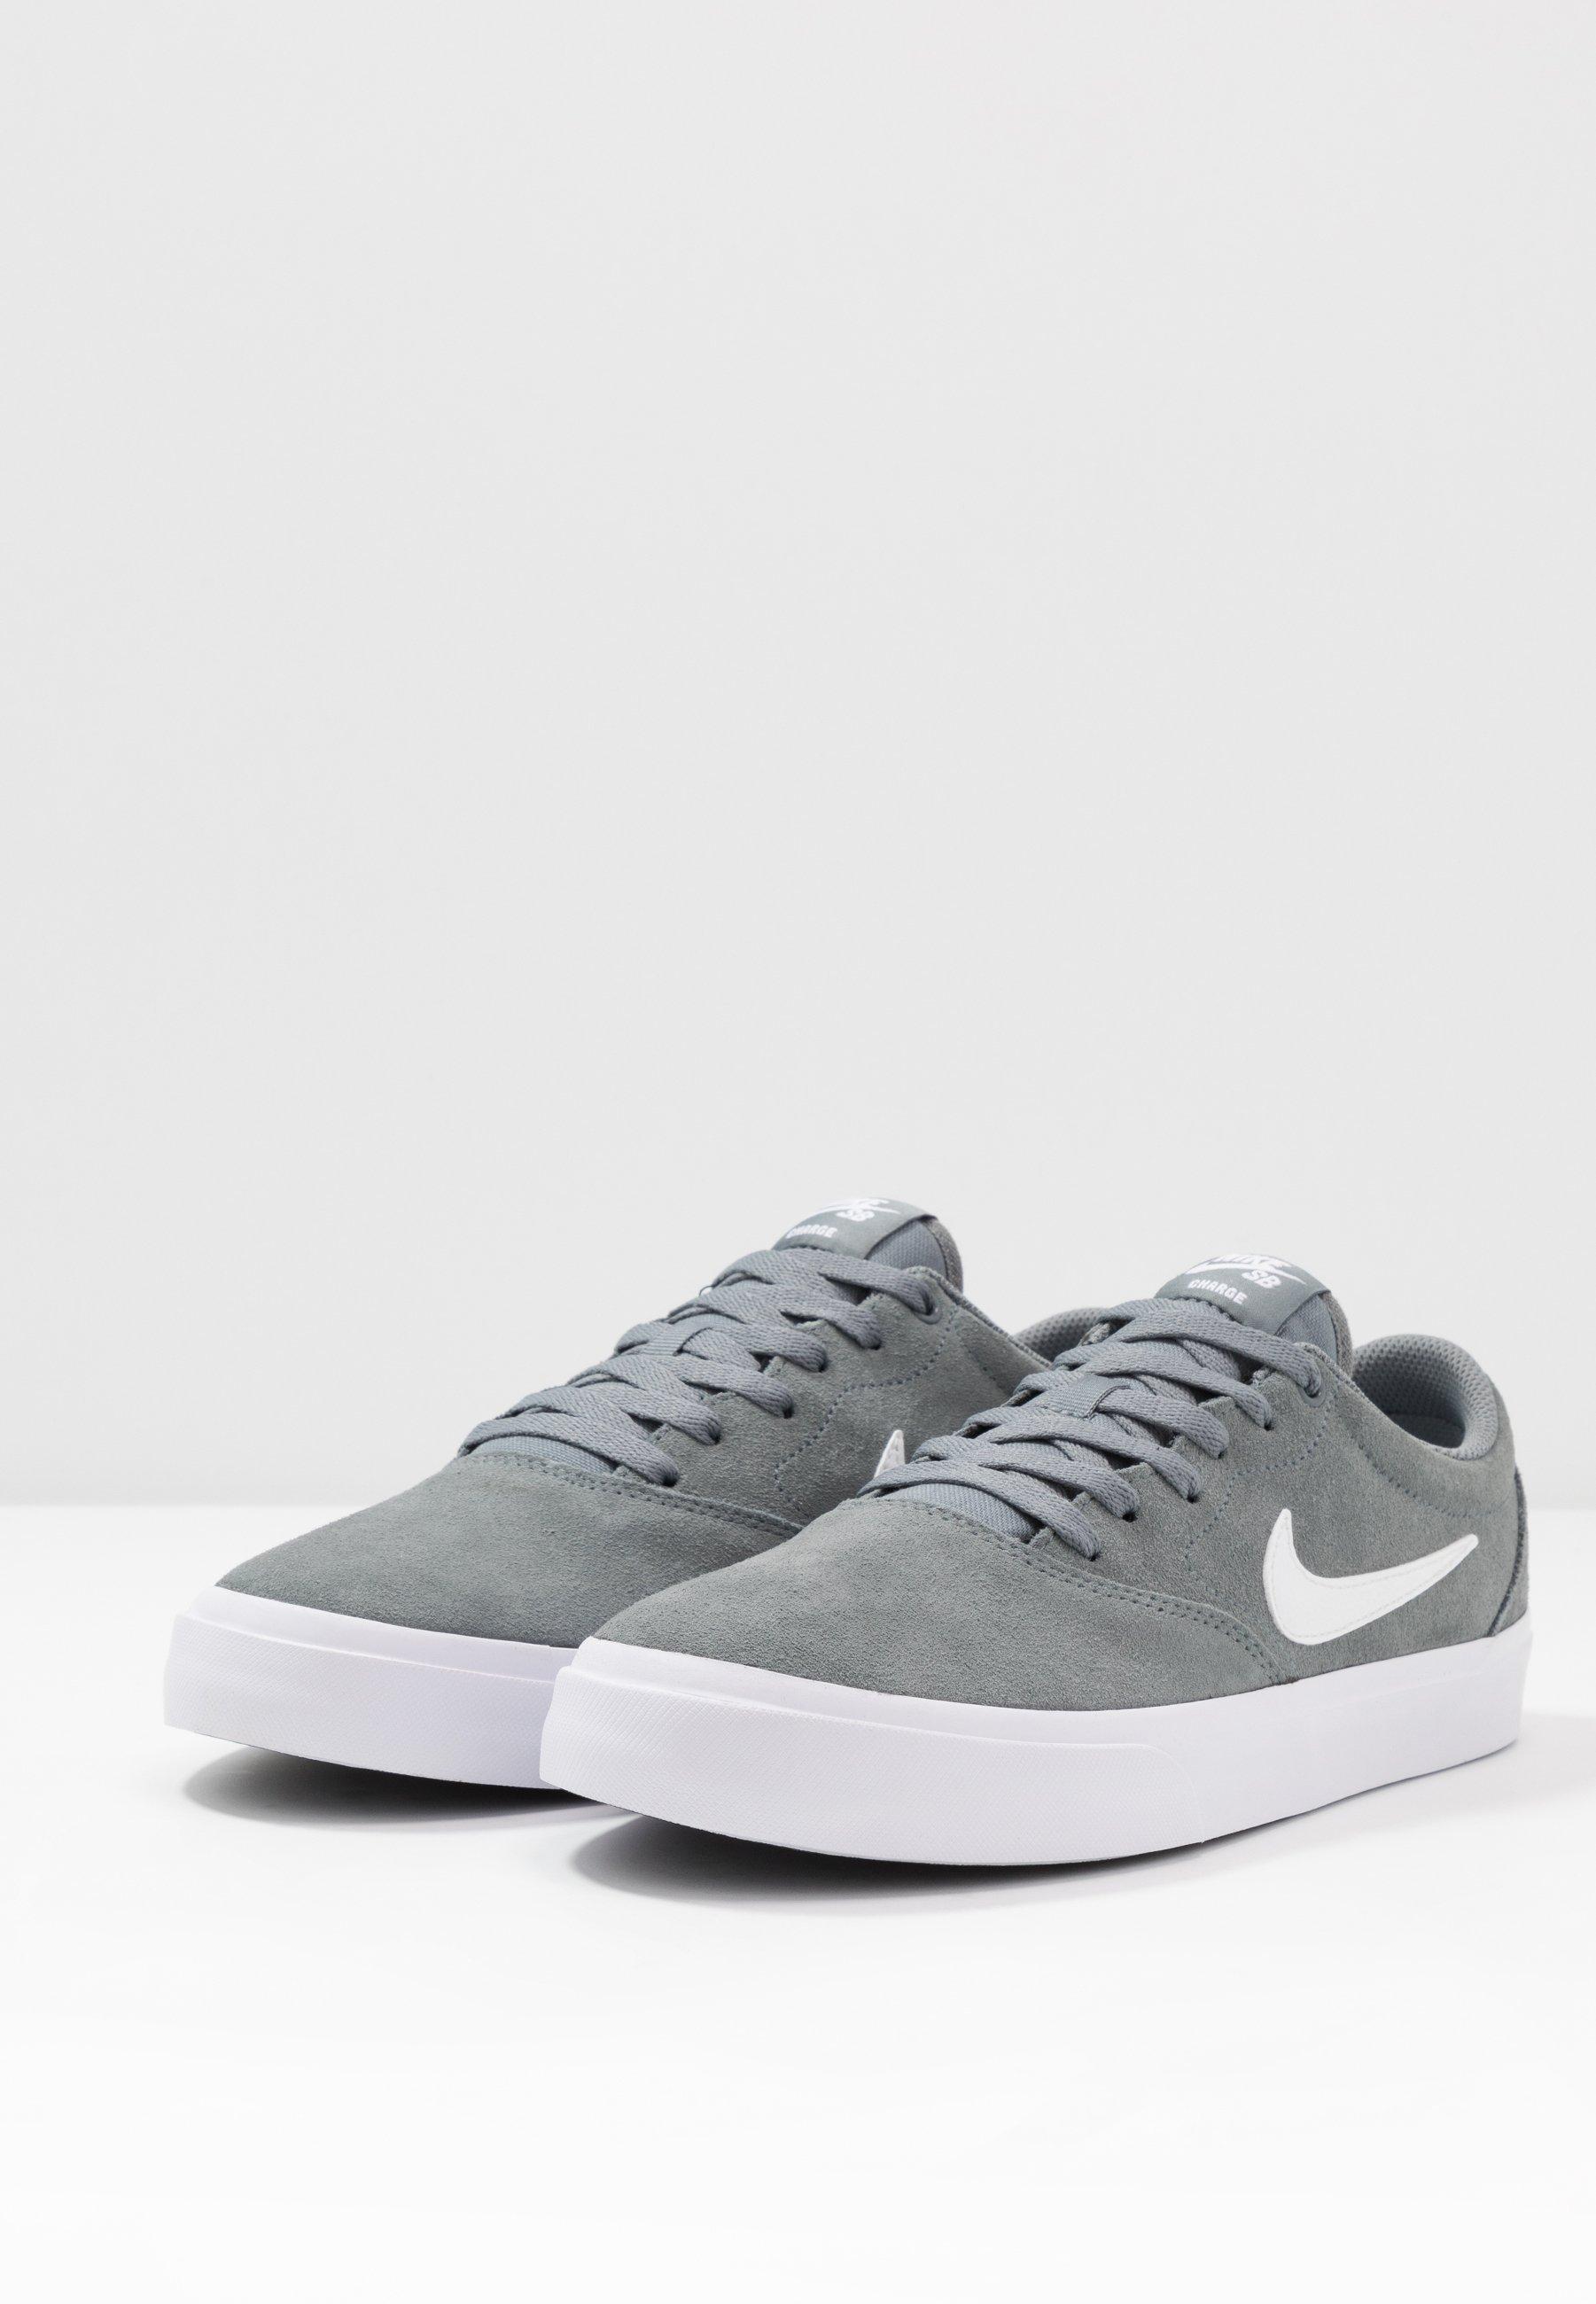 Nike SB CHARGE - Skate shoes - cool grey/white Women's Skate Shoes jyjsX